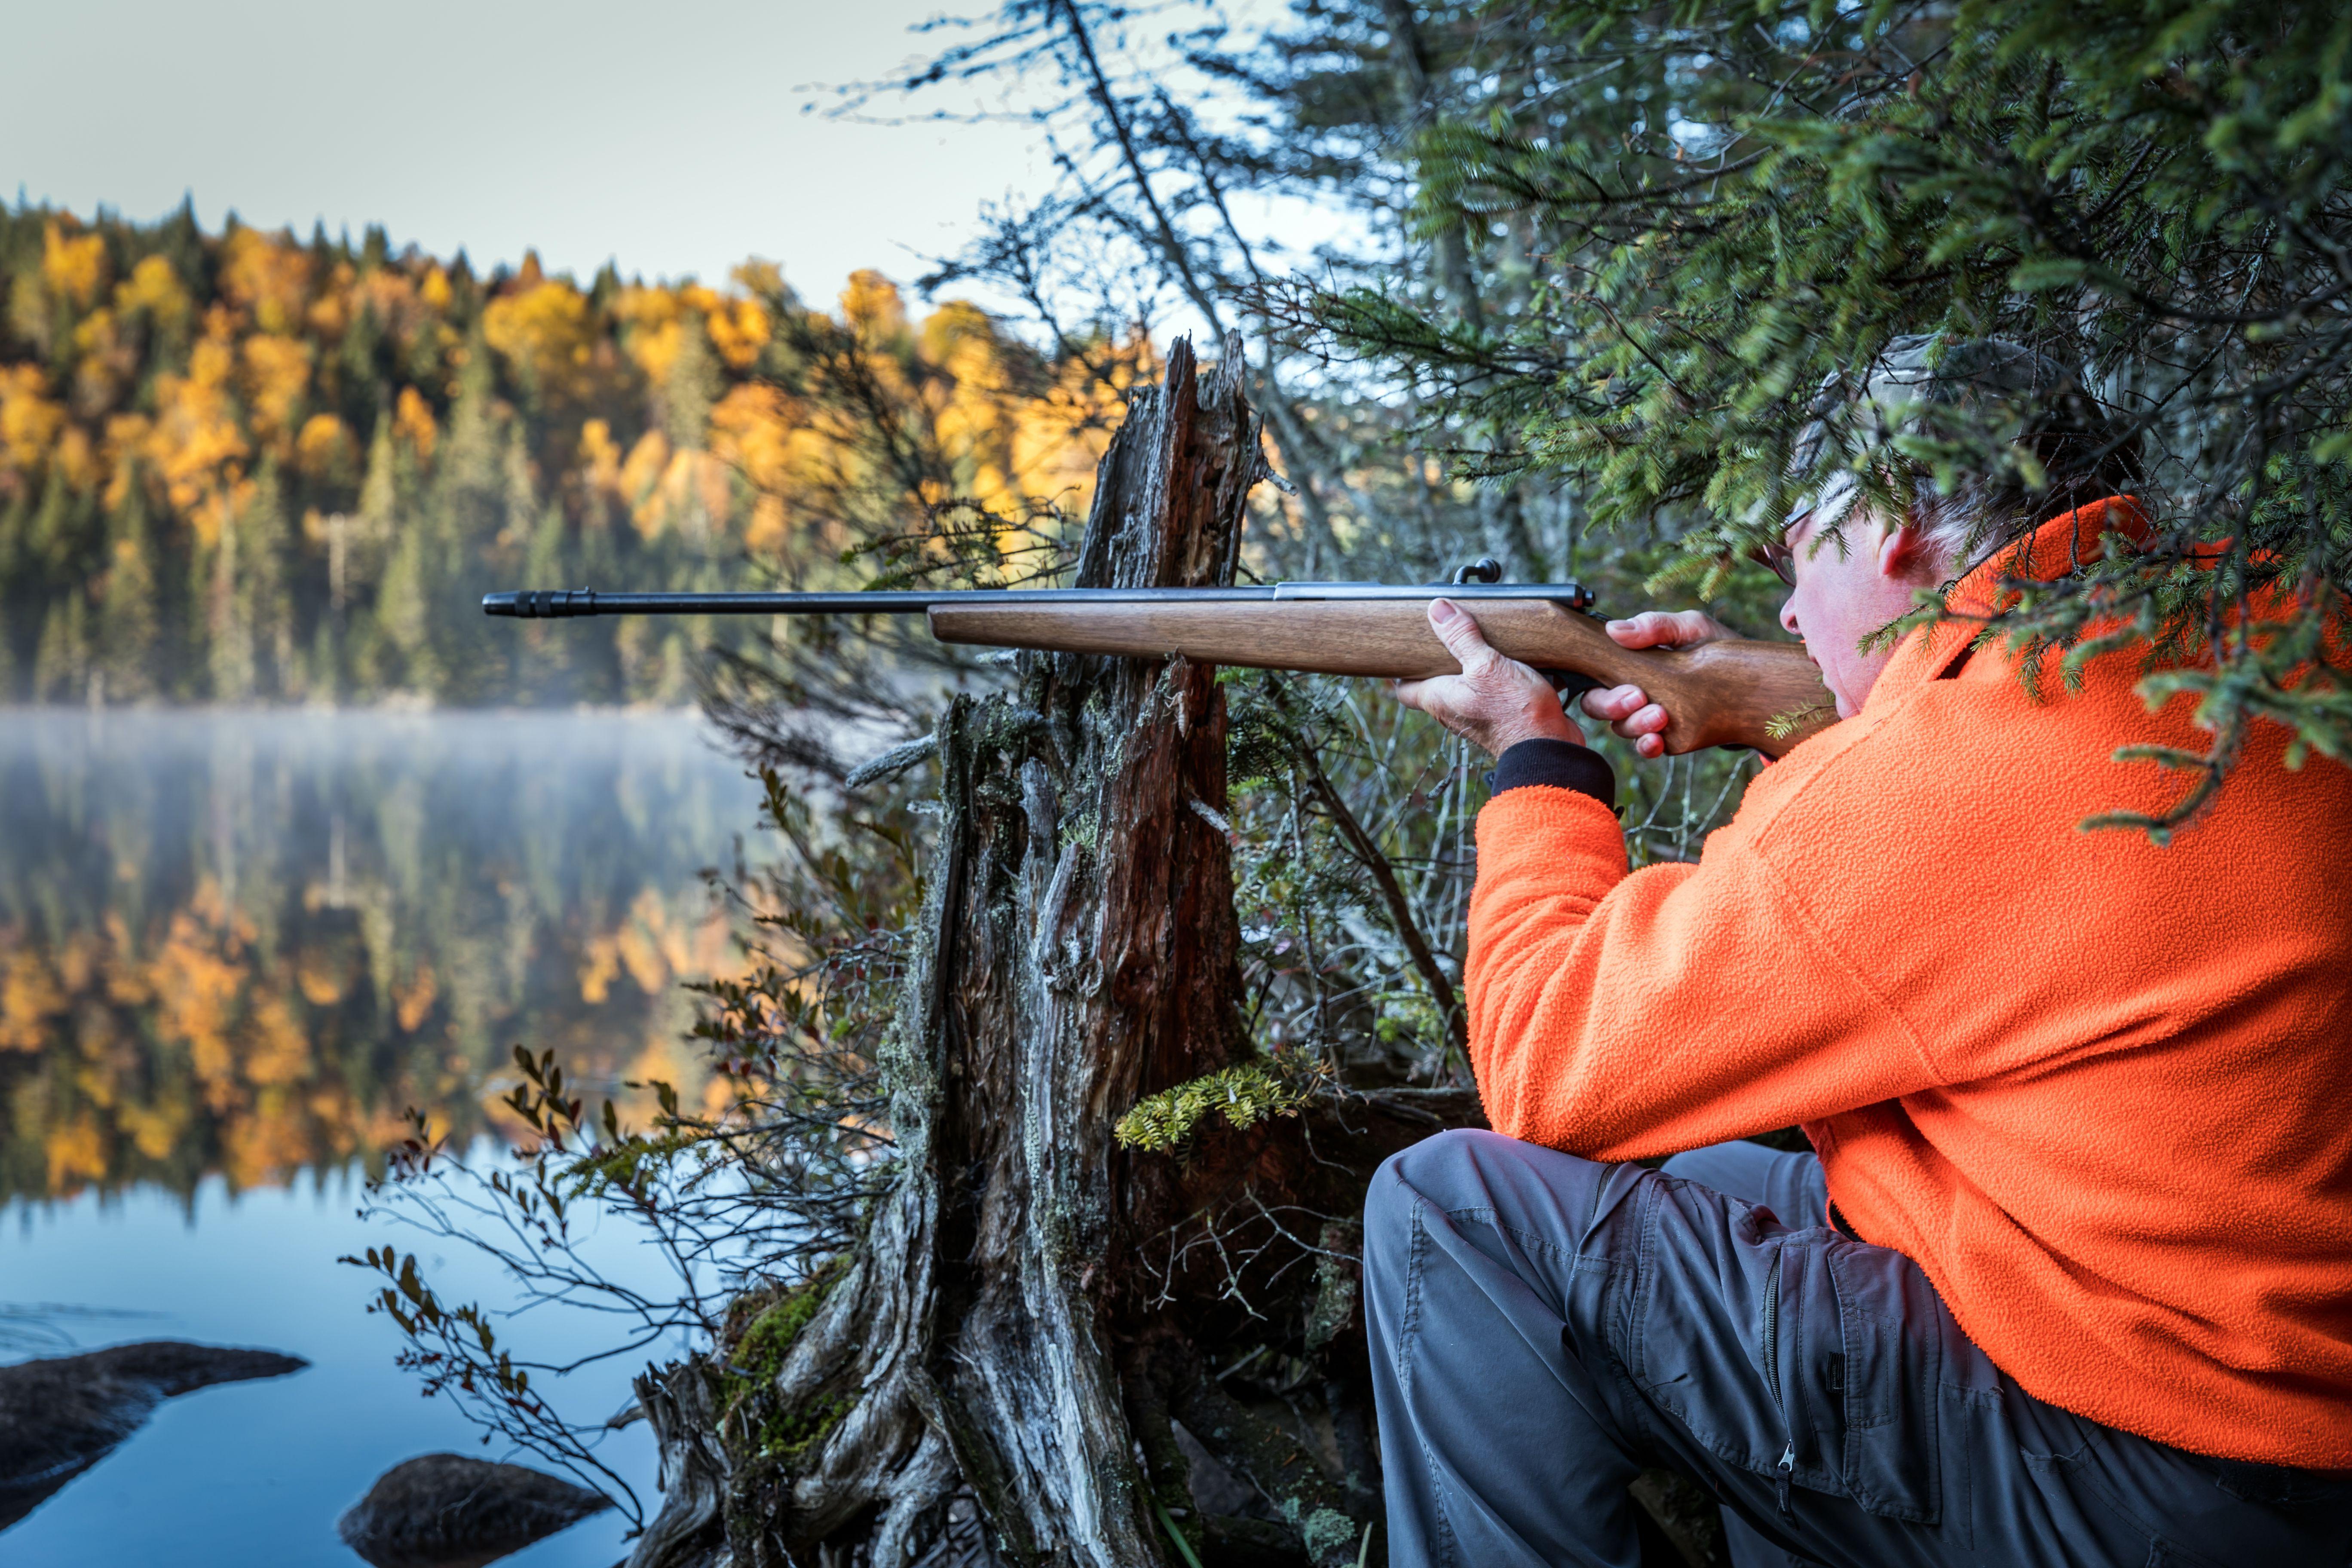 Senior Man Hunter Ready to Shoot a Target